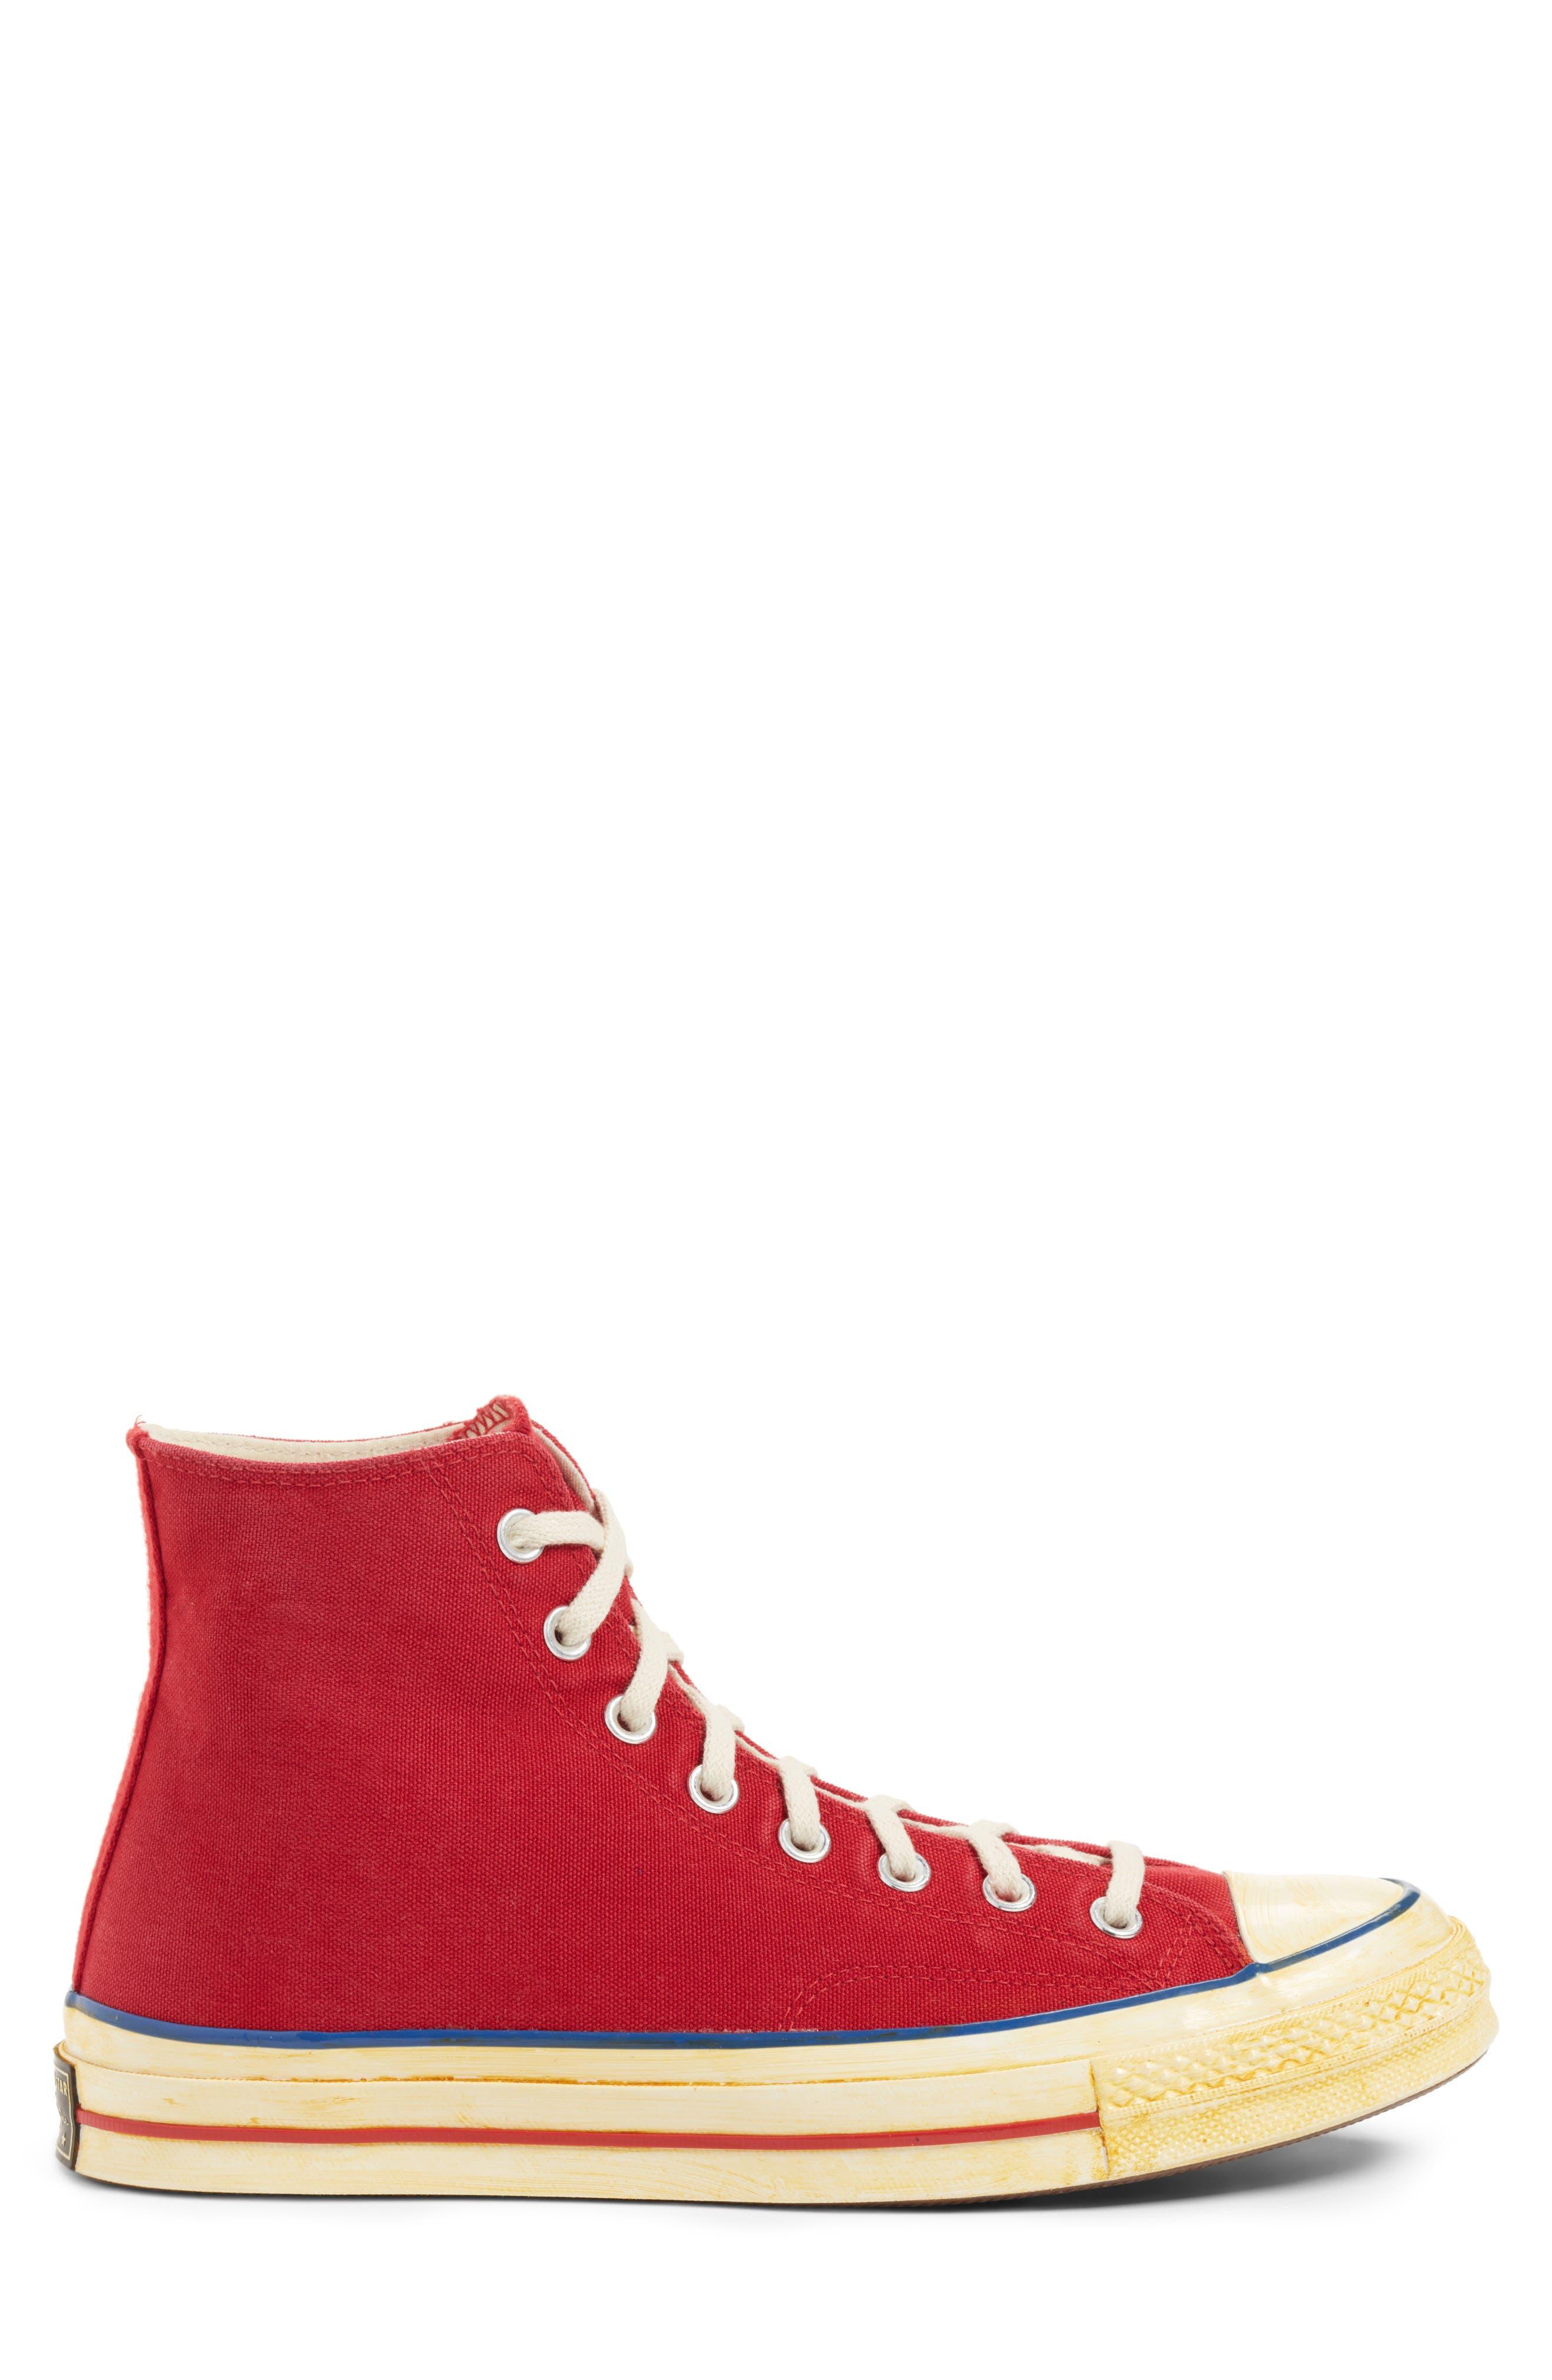 Alternate Image 3  - Converse Chuck Taylor® All Star® 70 High Top Sneaker (Men)